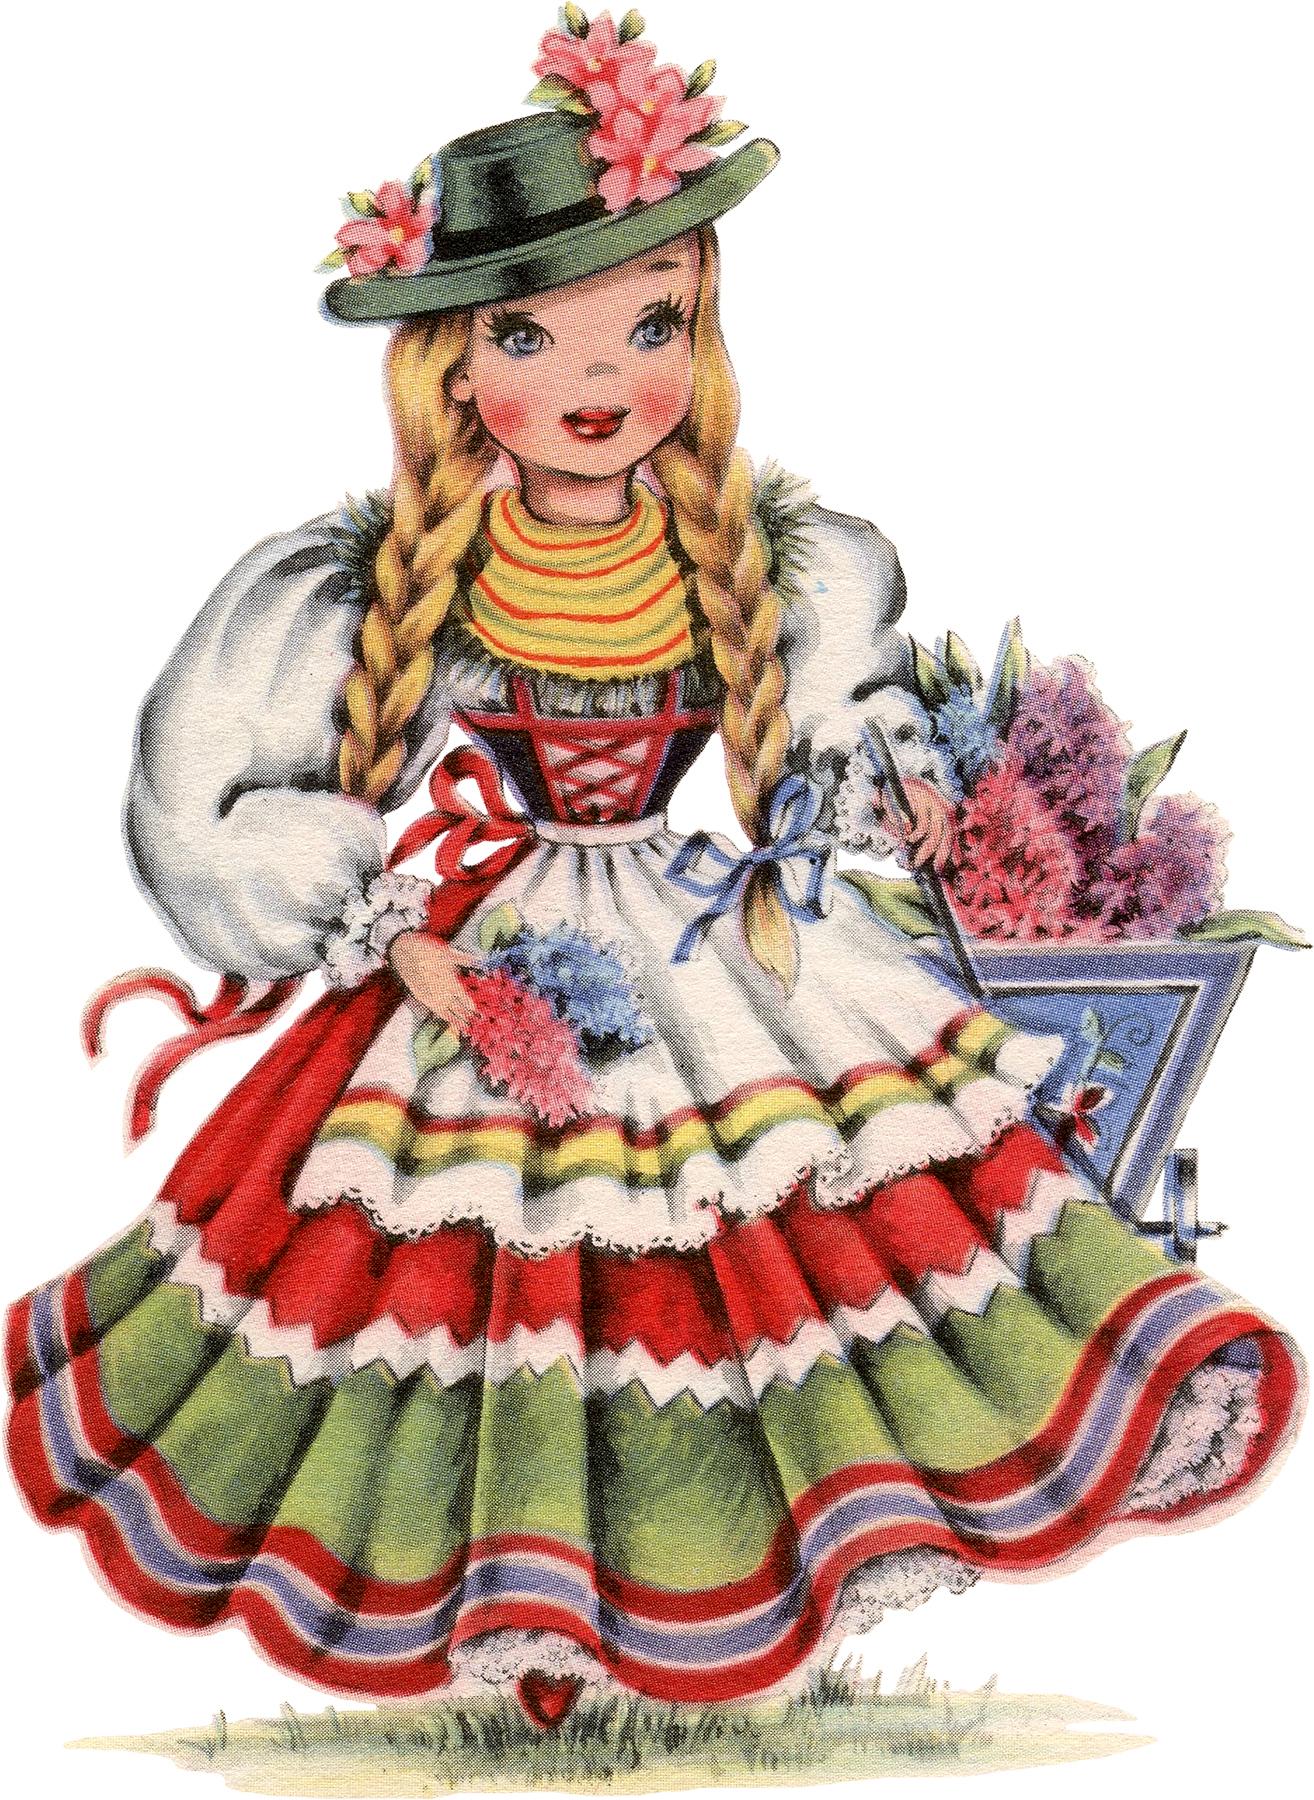 Retro German Doll Image!